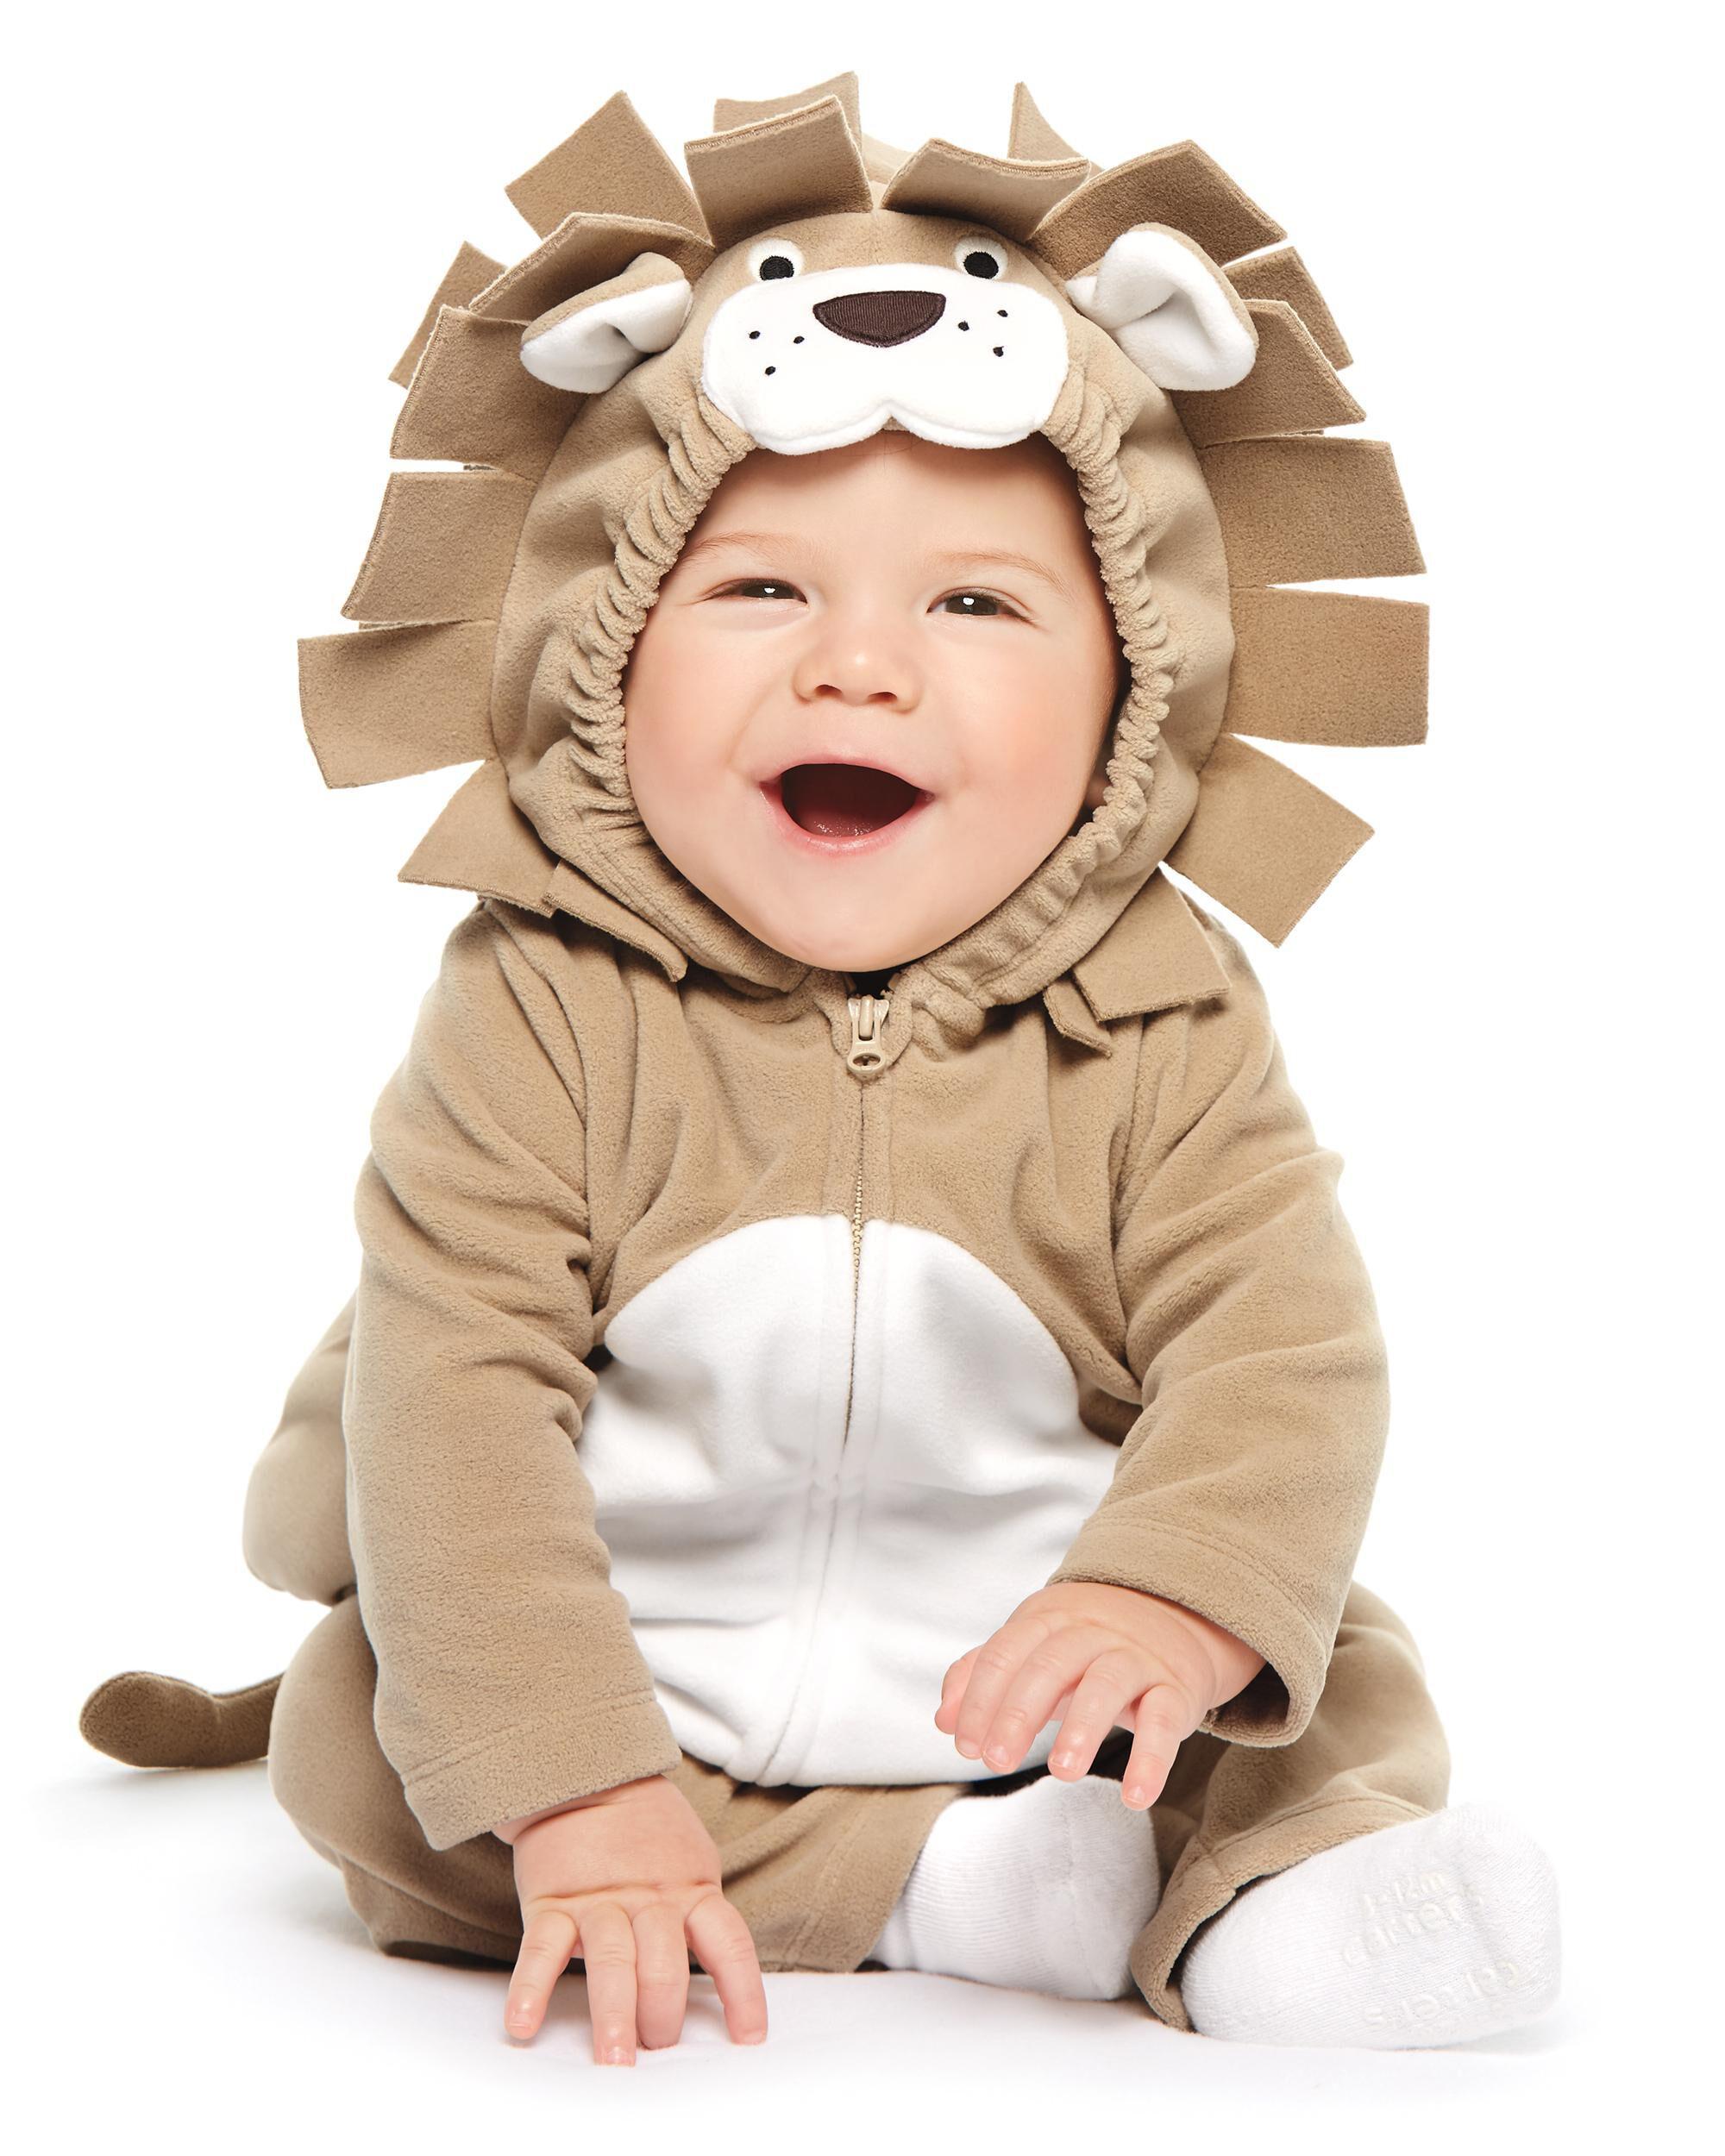 Little Lion Halloween Costume ...  sc 1 st  Carteru0027s & Little Lion Halloween Costume